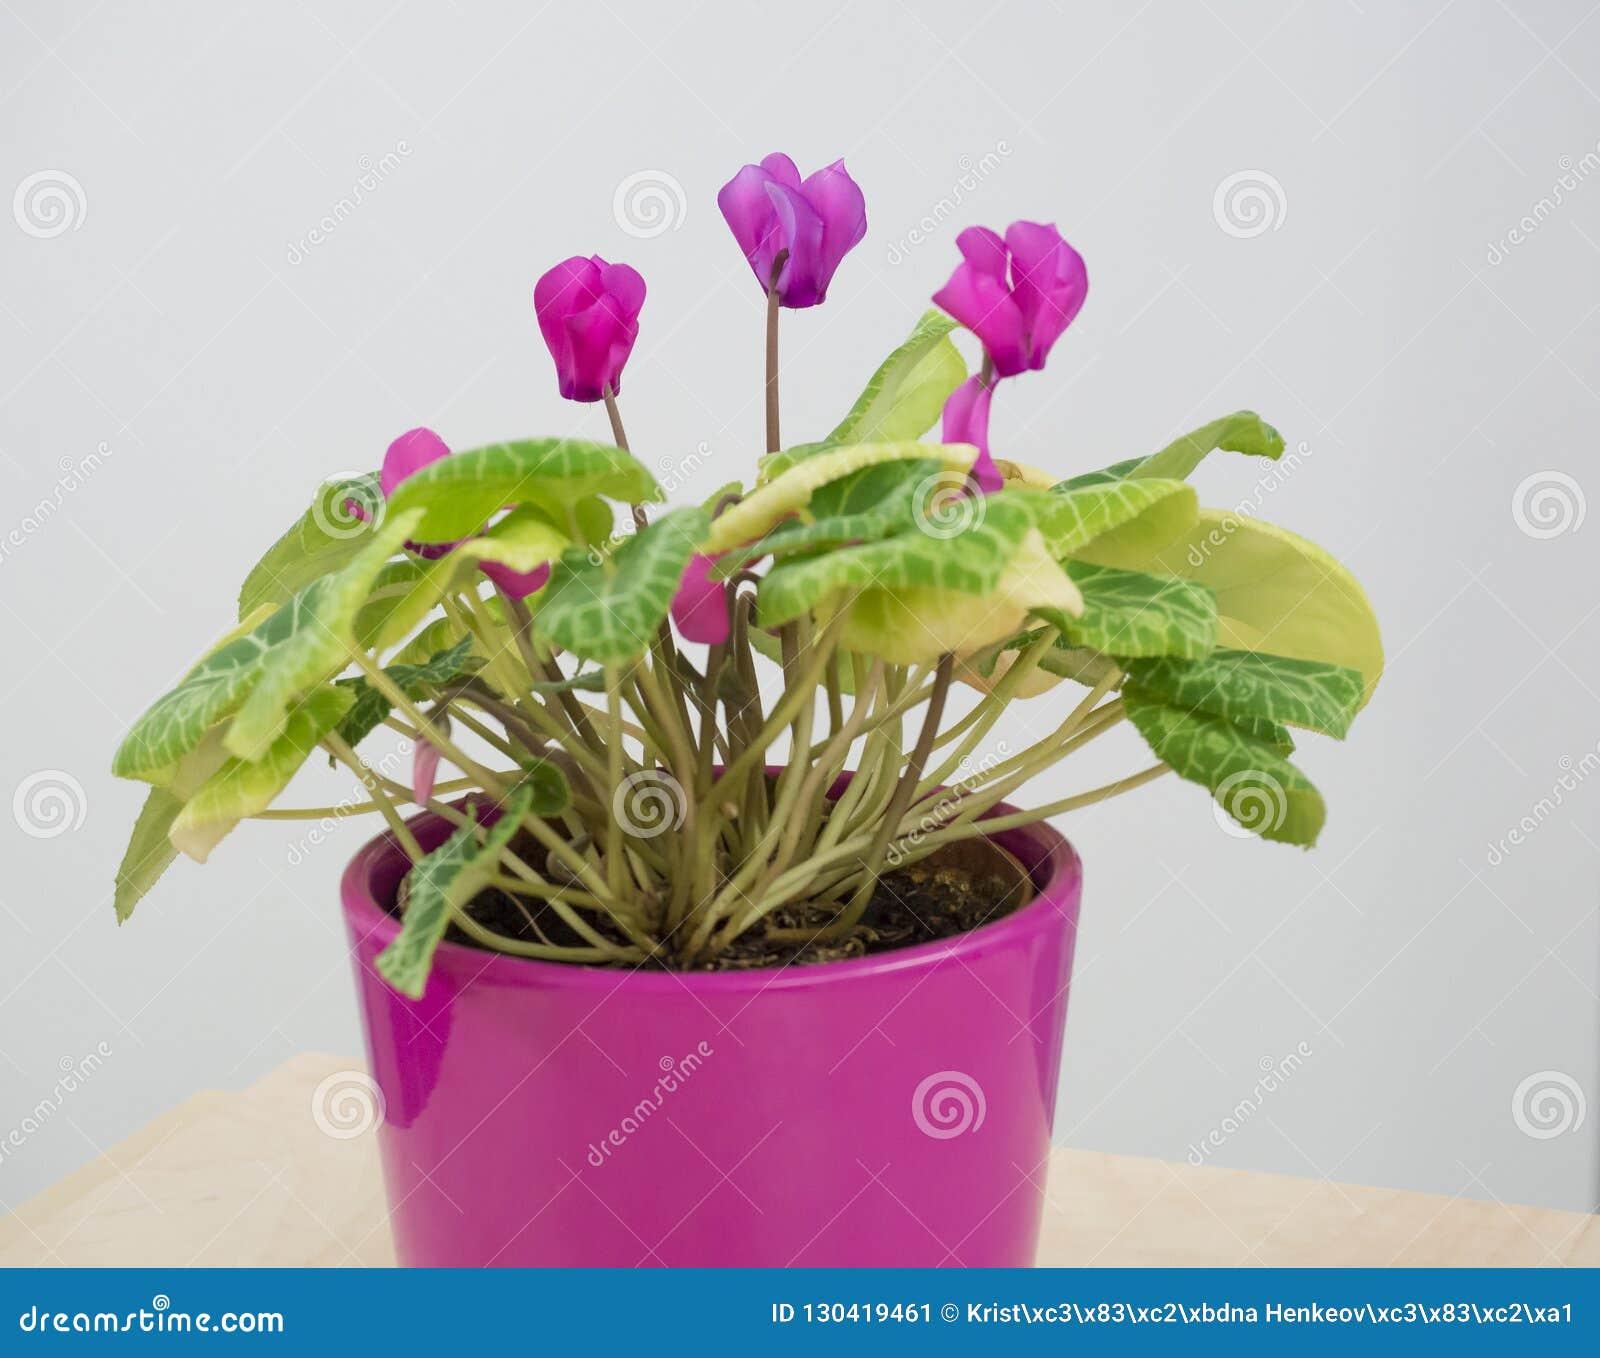 Pink blooming Lathyrus,peavines or vetchlings flowe in pink flowerpot on white background